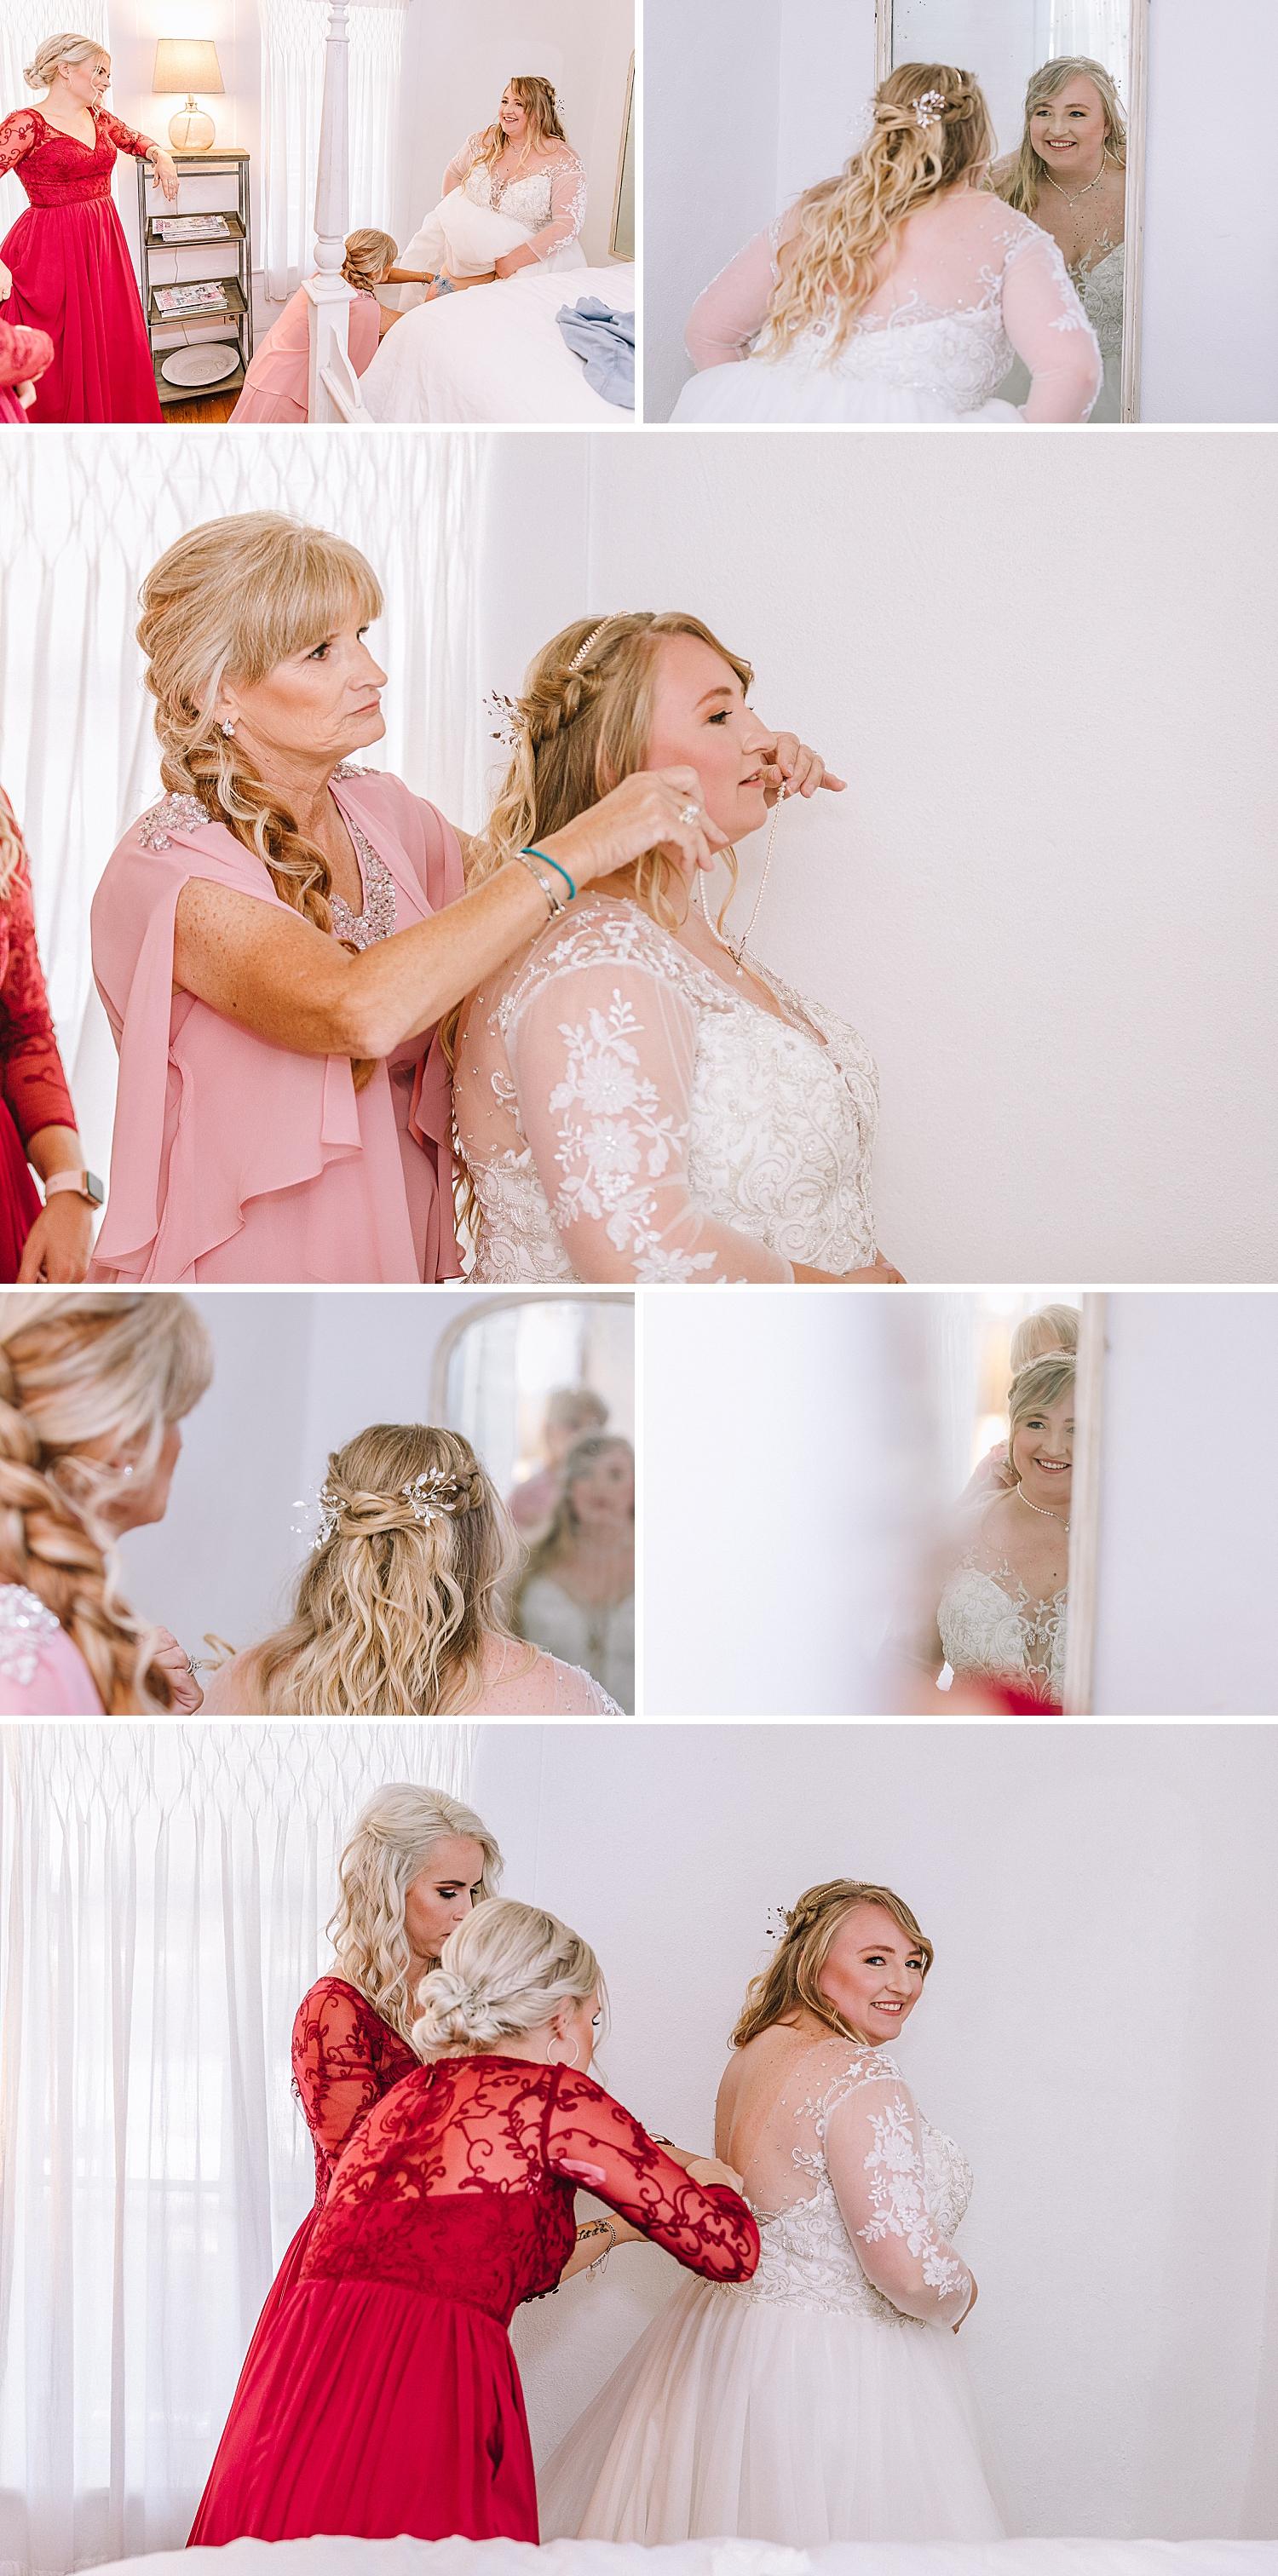 New-Braunfels-Wedding-Photographer-Gruene-Estate-Carly-Barton-Photography_0024.jpg